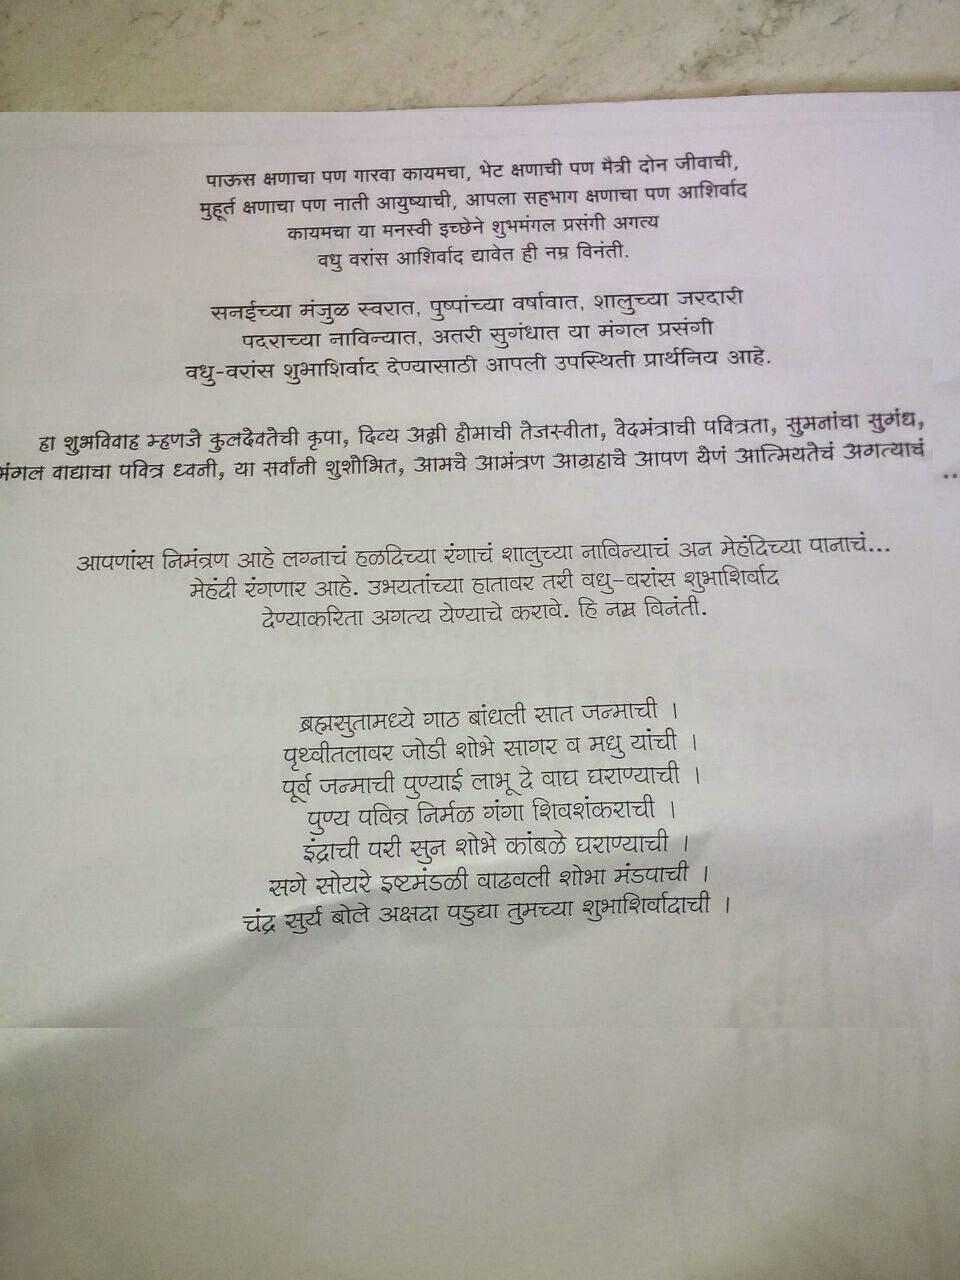 Wedding invitation message for whatsapp in marathi for Wedding invitations wording for whatsapp